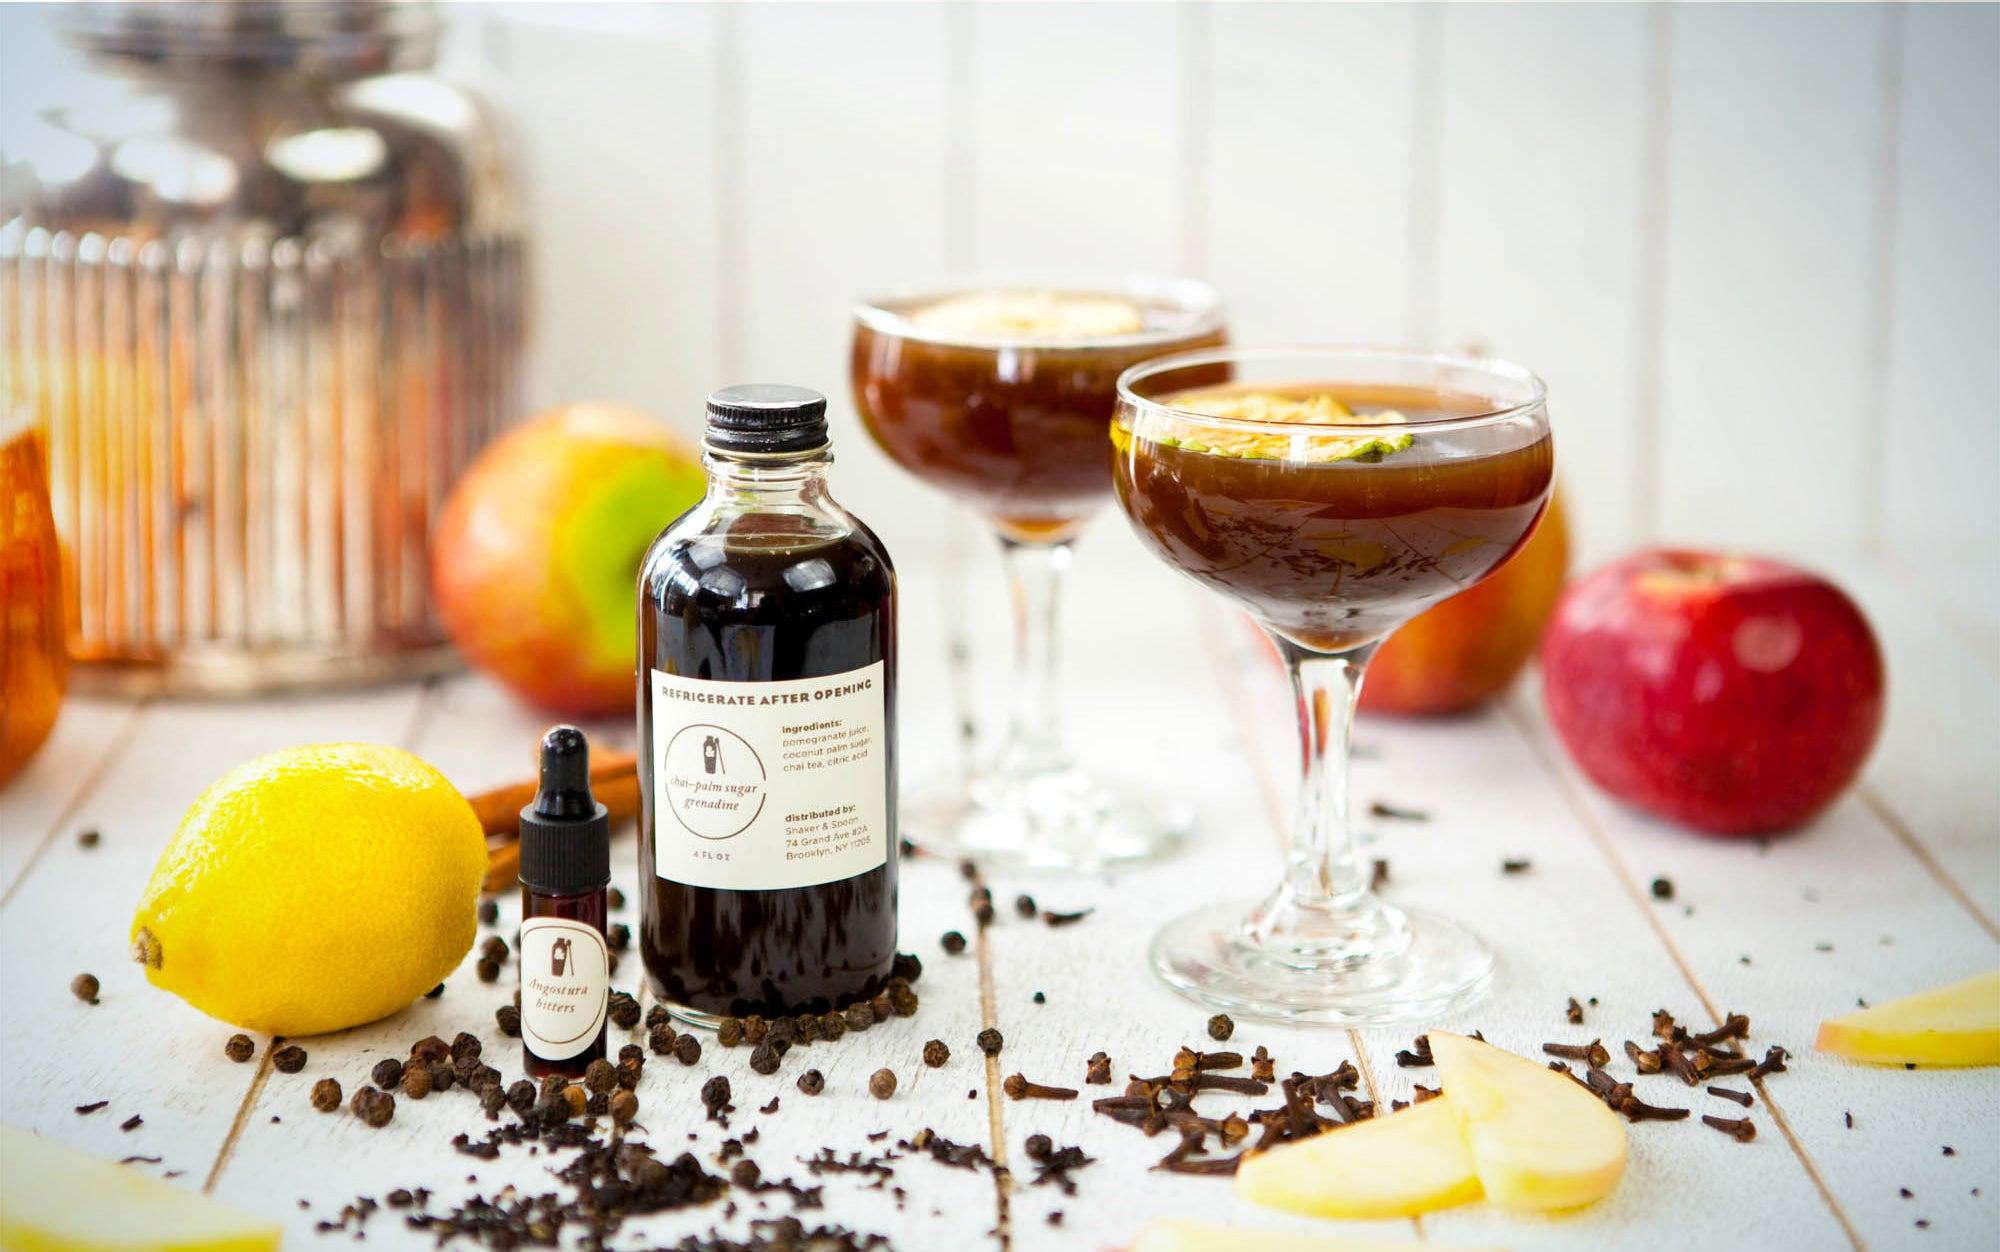 Shaker & Spoon cocktail club